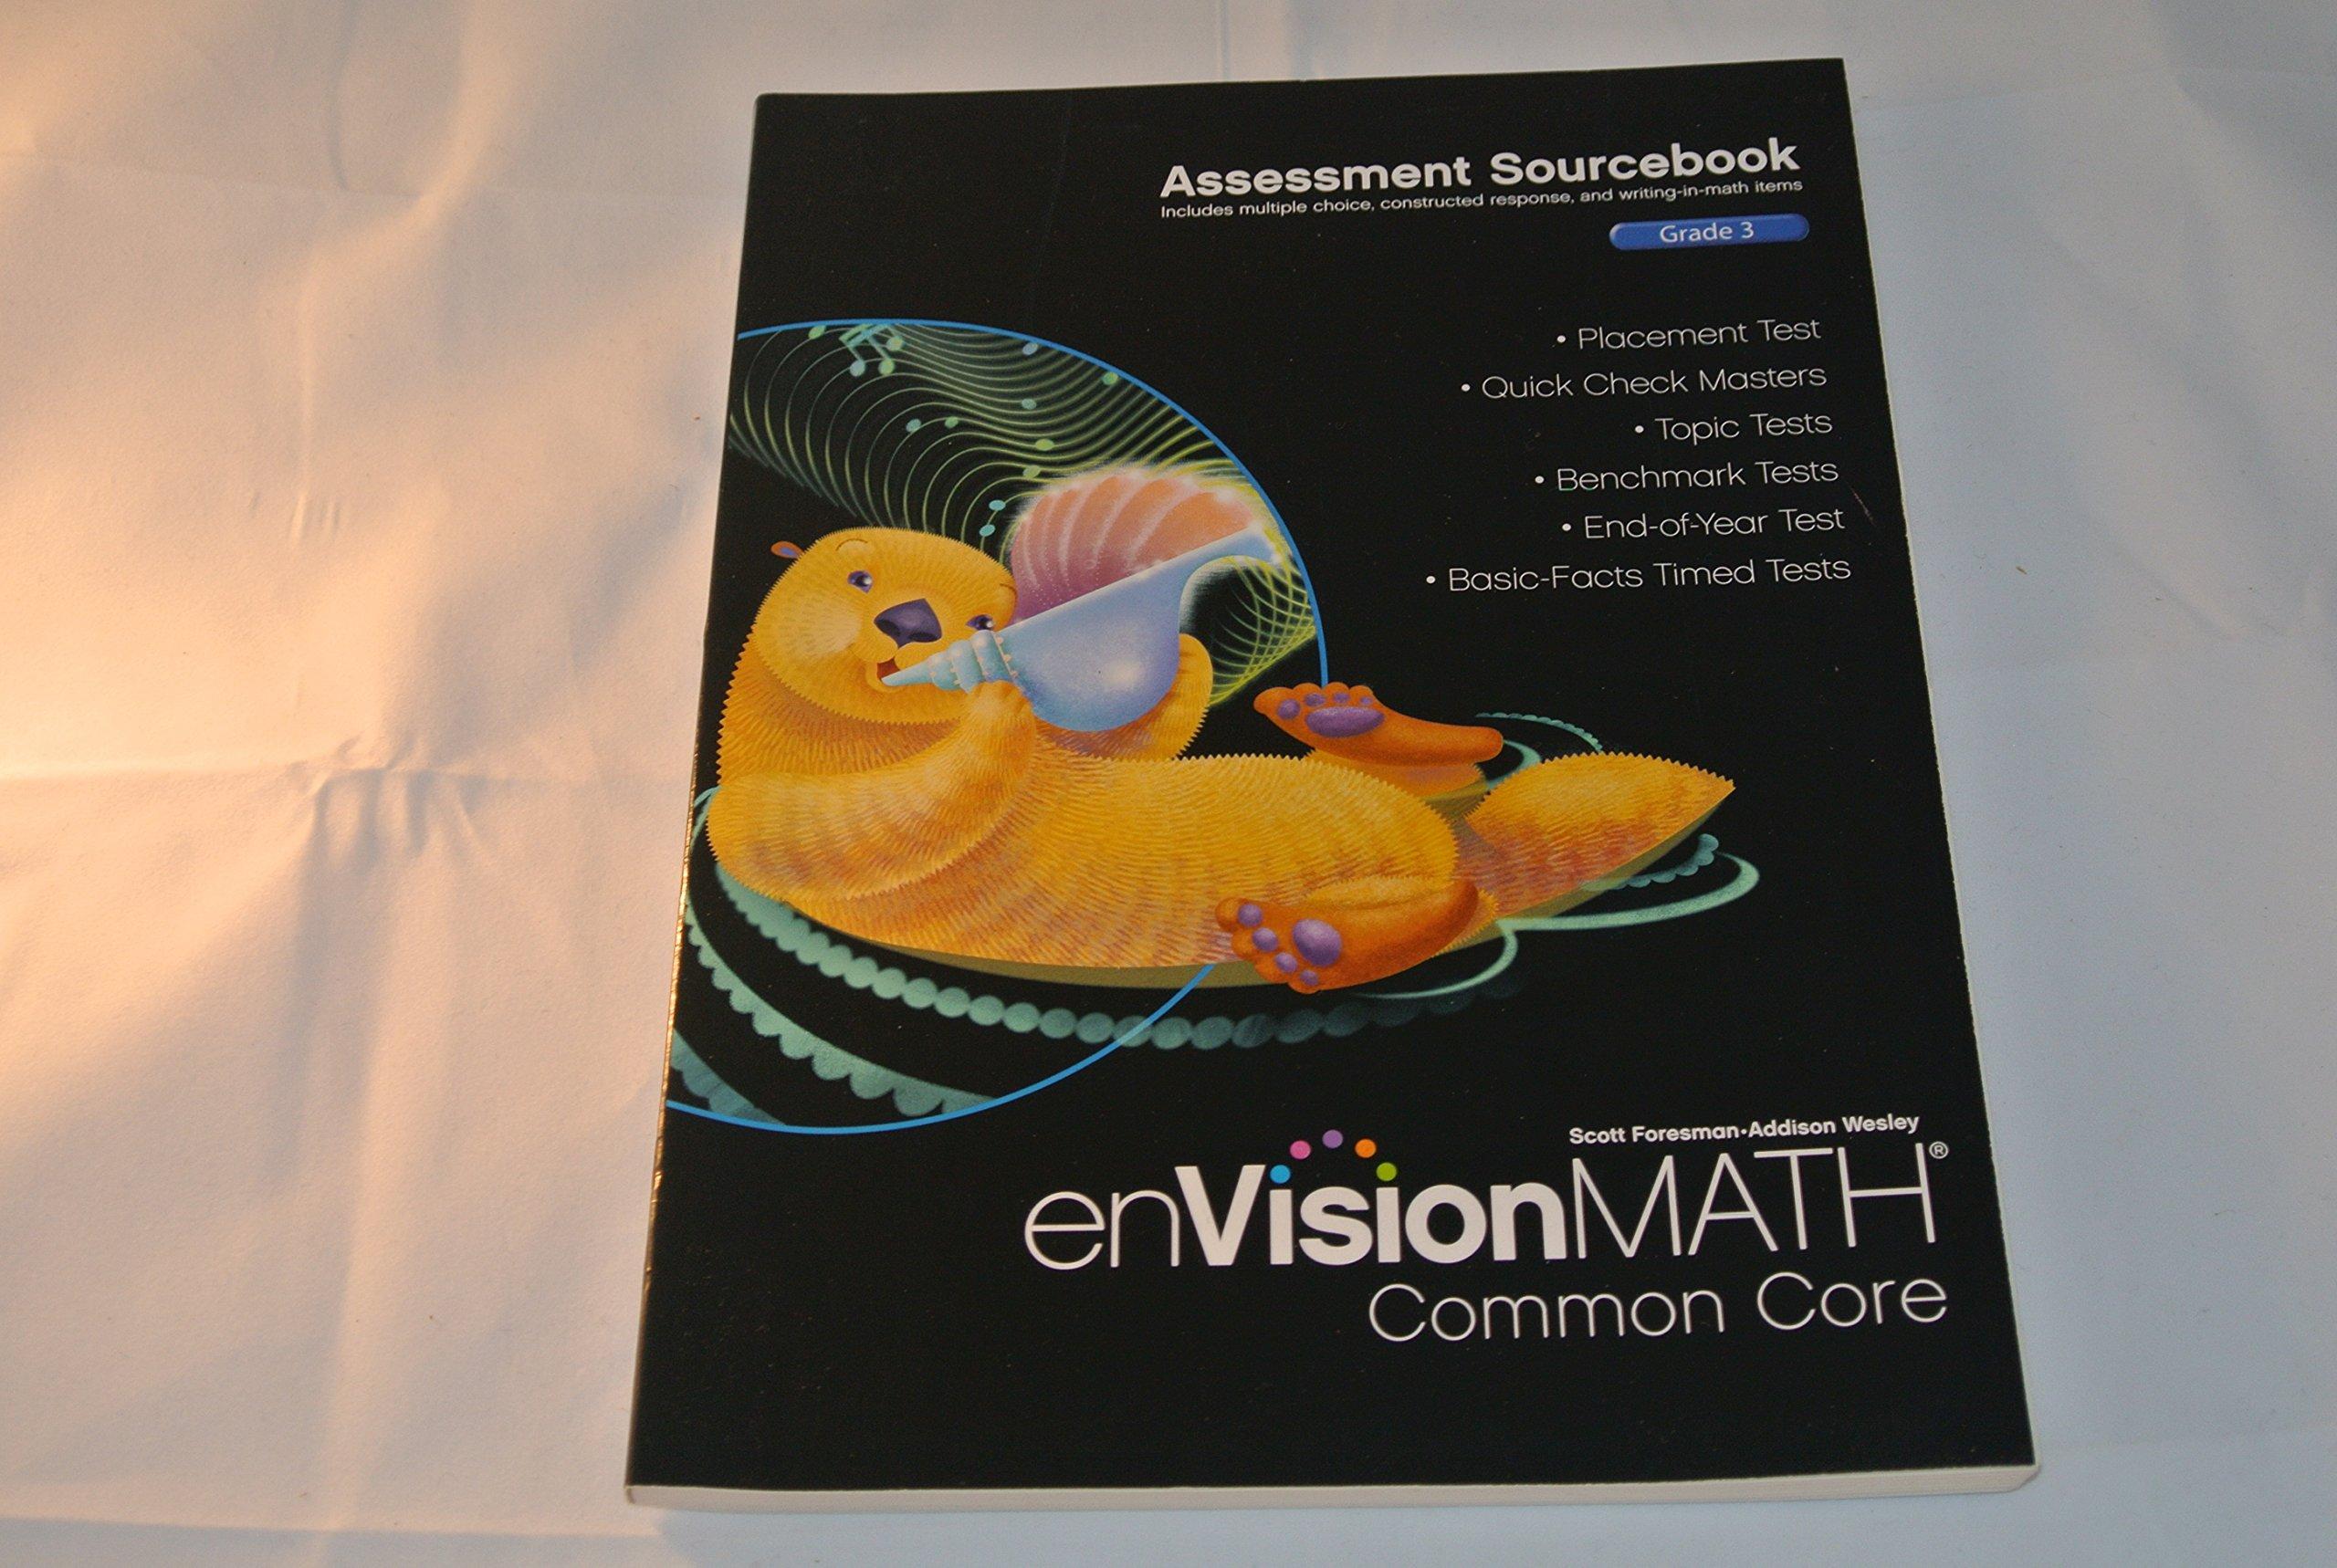 Amazon envision math common core assessment sourcebook grade 3 amazon envision math common core assessment sourcebook grade 3 envision math common core 9780328731343 scott foresman addison wesley books fandeluxe Images